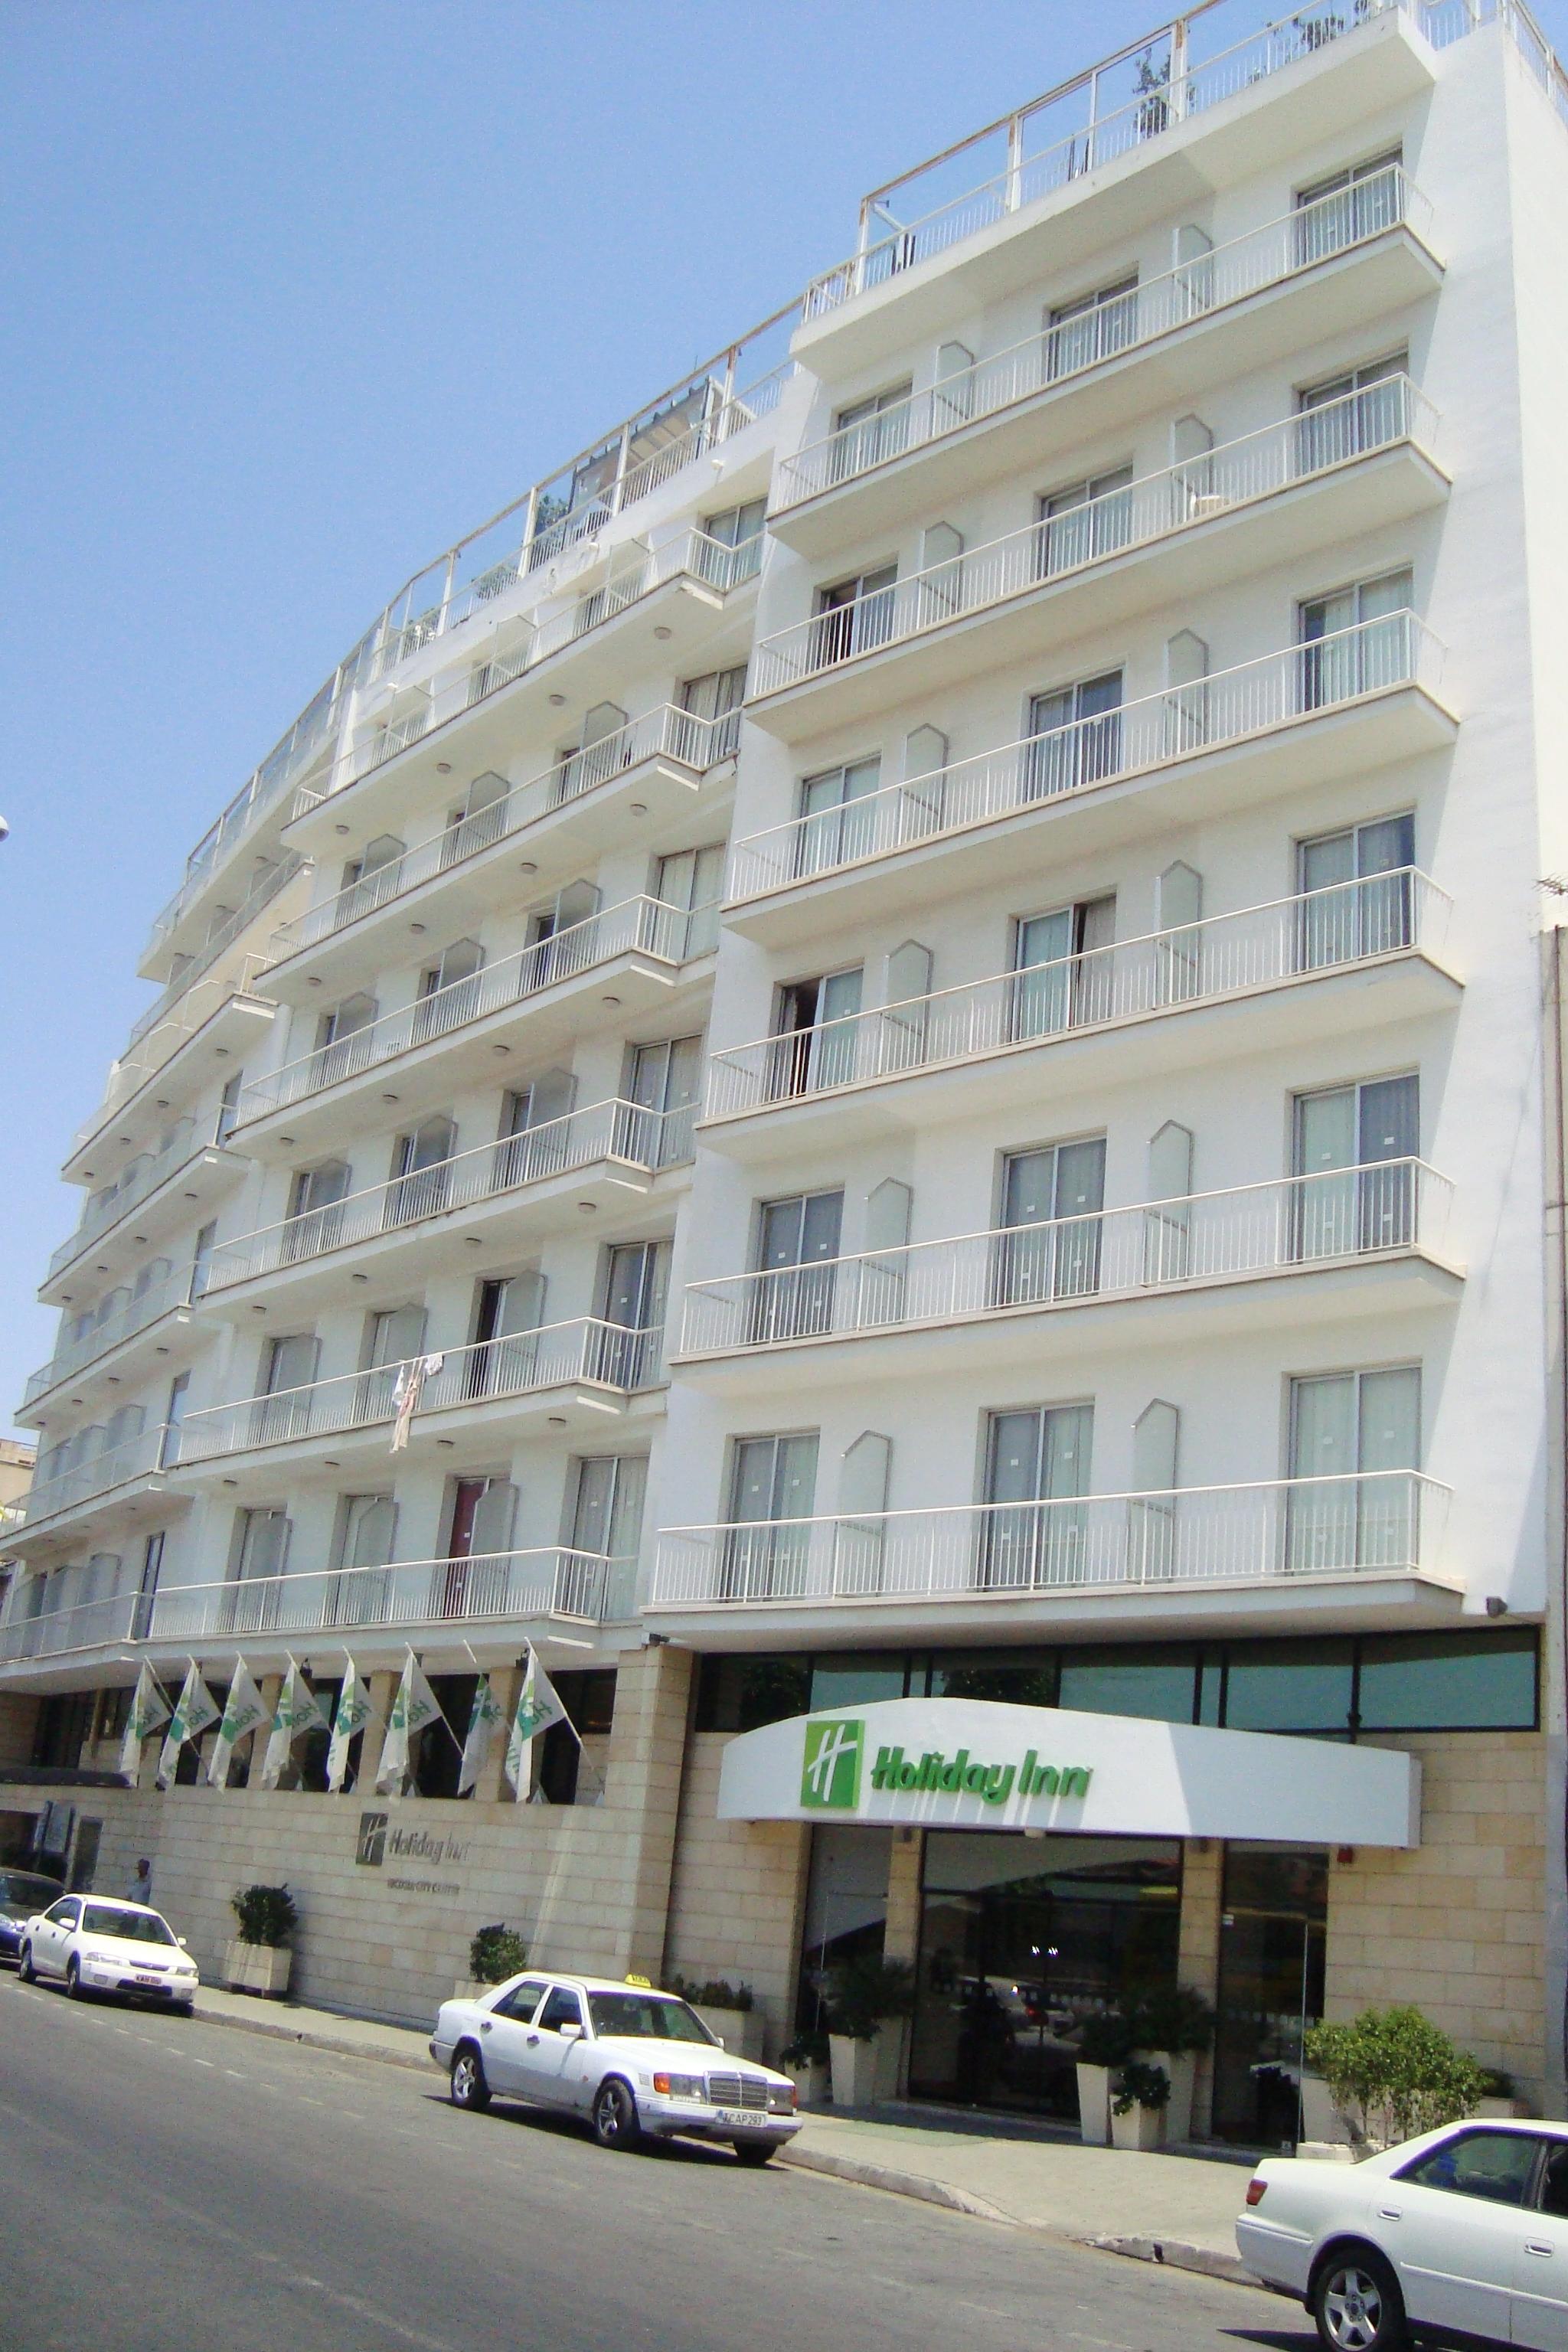 Hotel Holiday Inn Hamburg Busverbindung